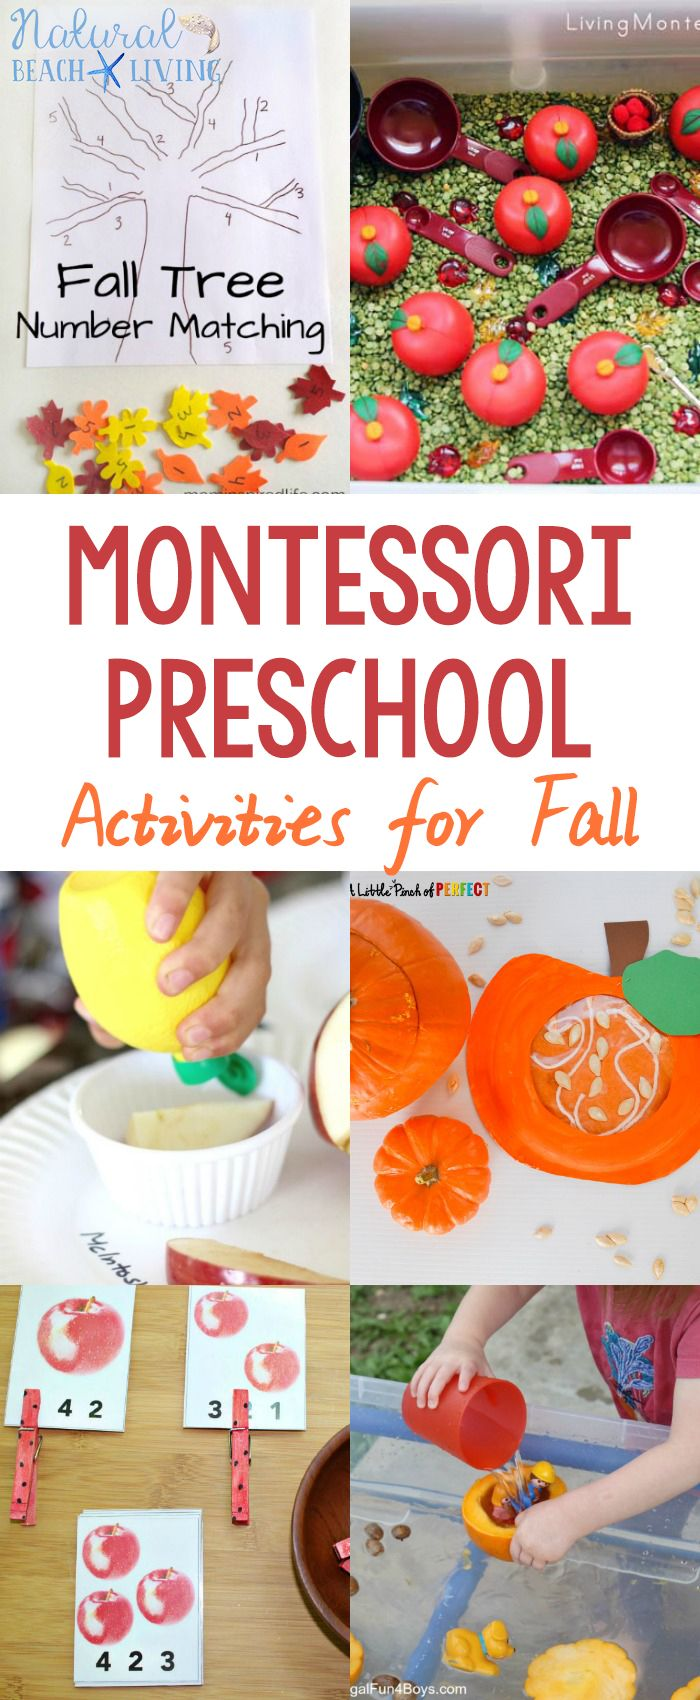 30+ Amazing Montessori Fall Activities for Preschool and Kindergarten, Montessori Fall Practical Life, Montessori Books, Montessori Printables, Montessori Themes #Montessori